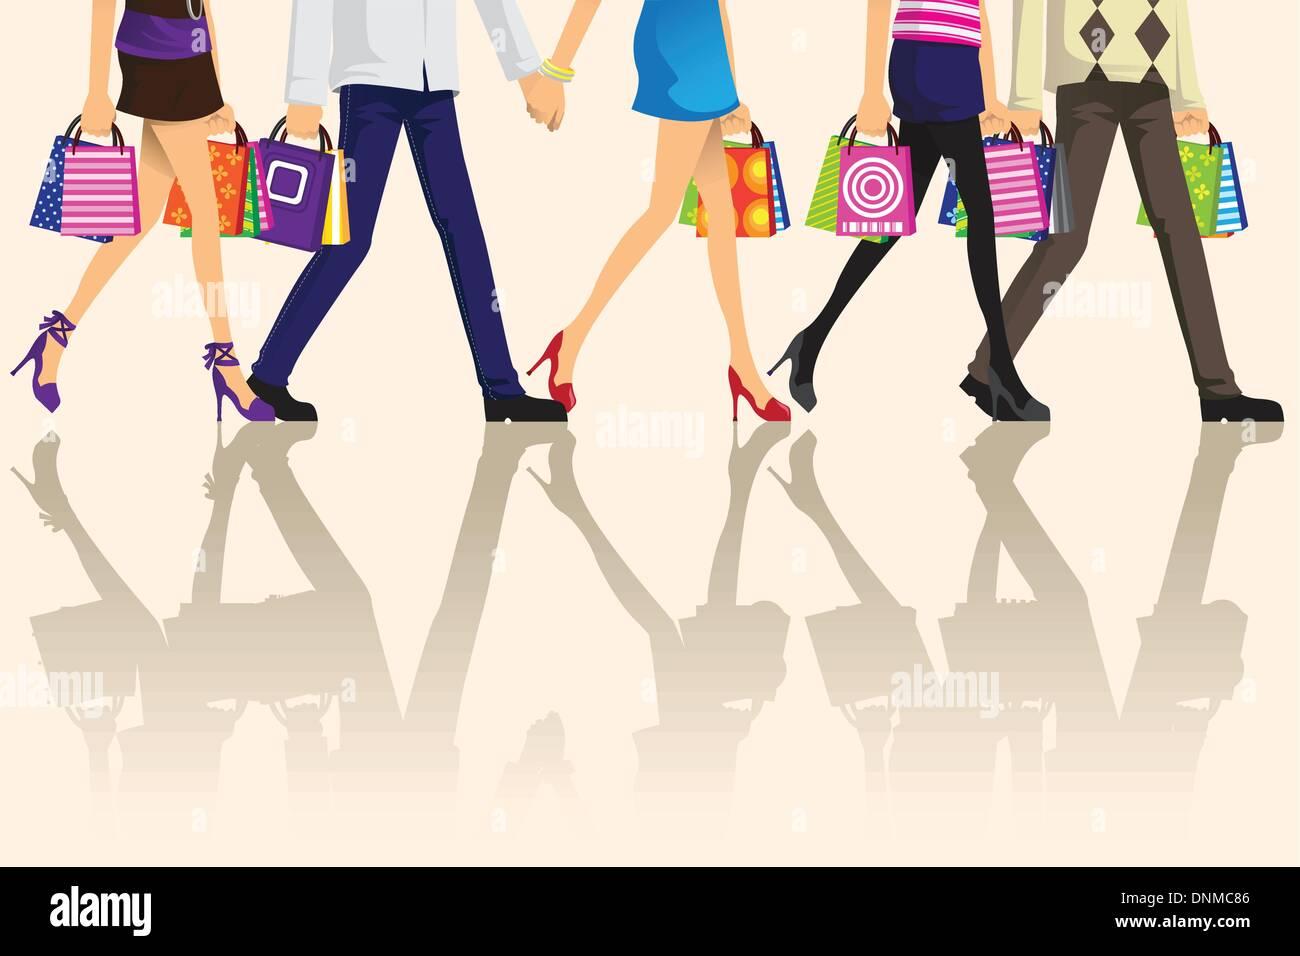 Un vecteur illustration de shopping people carrying shopping bags Photo Stock